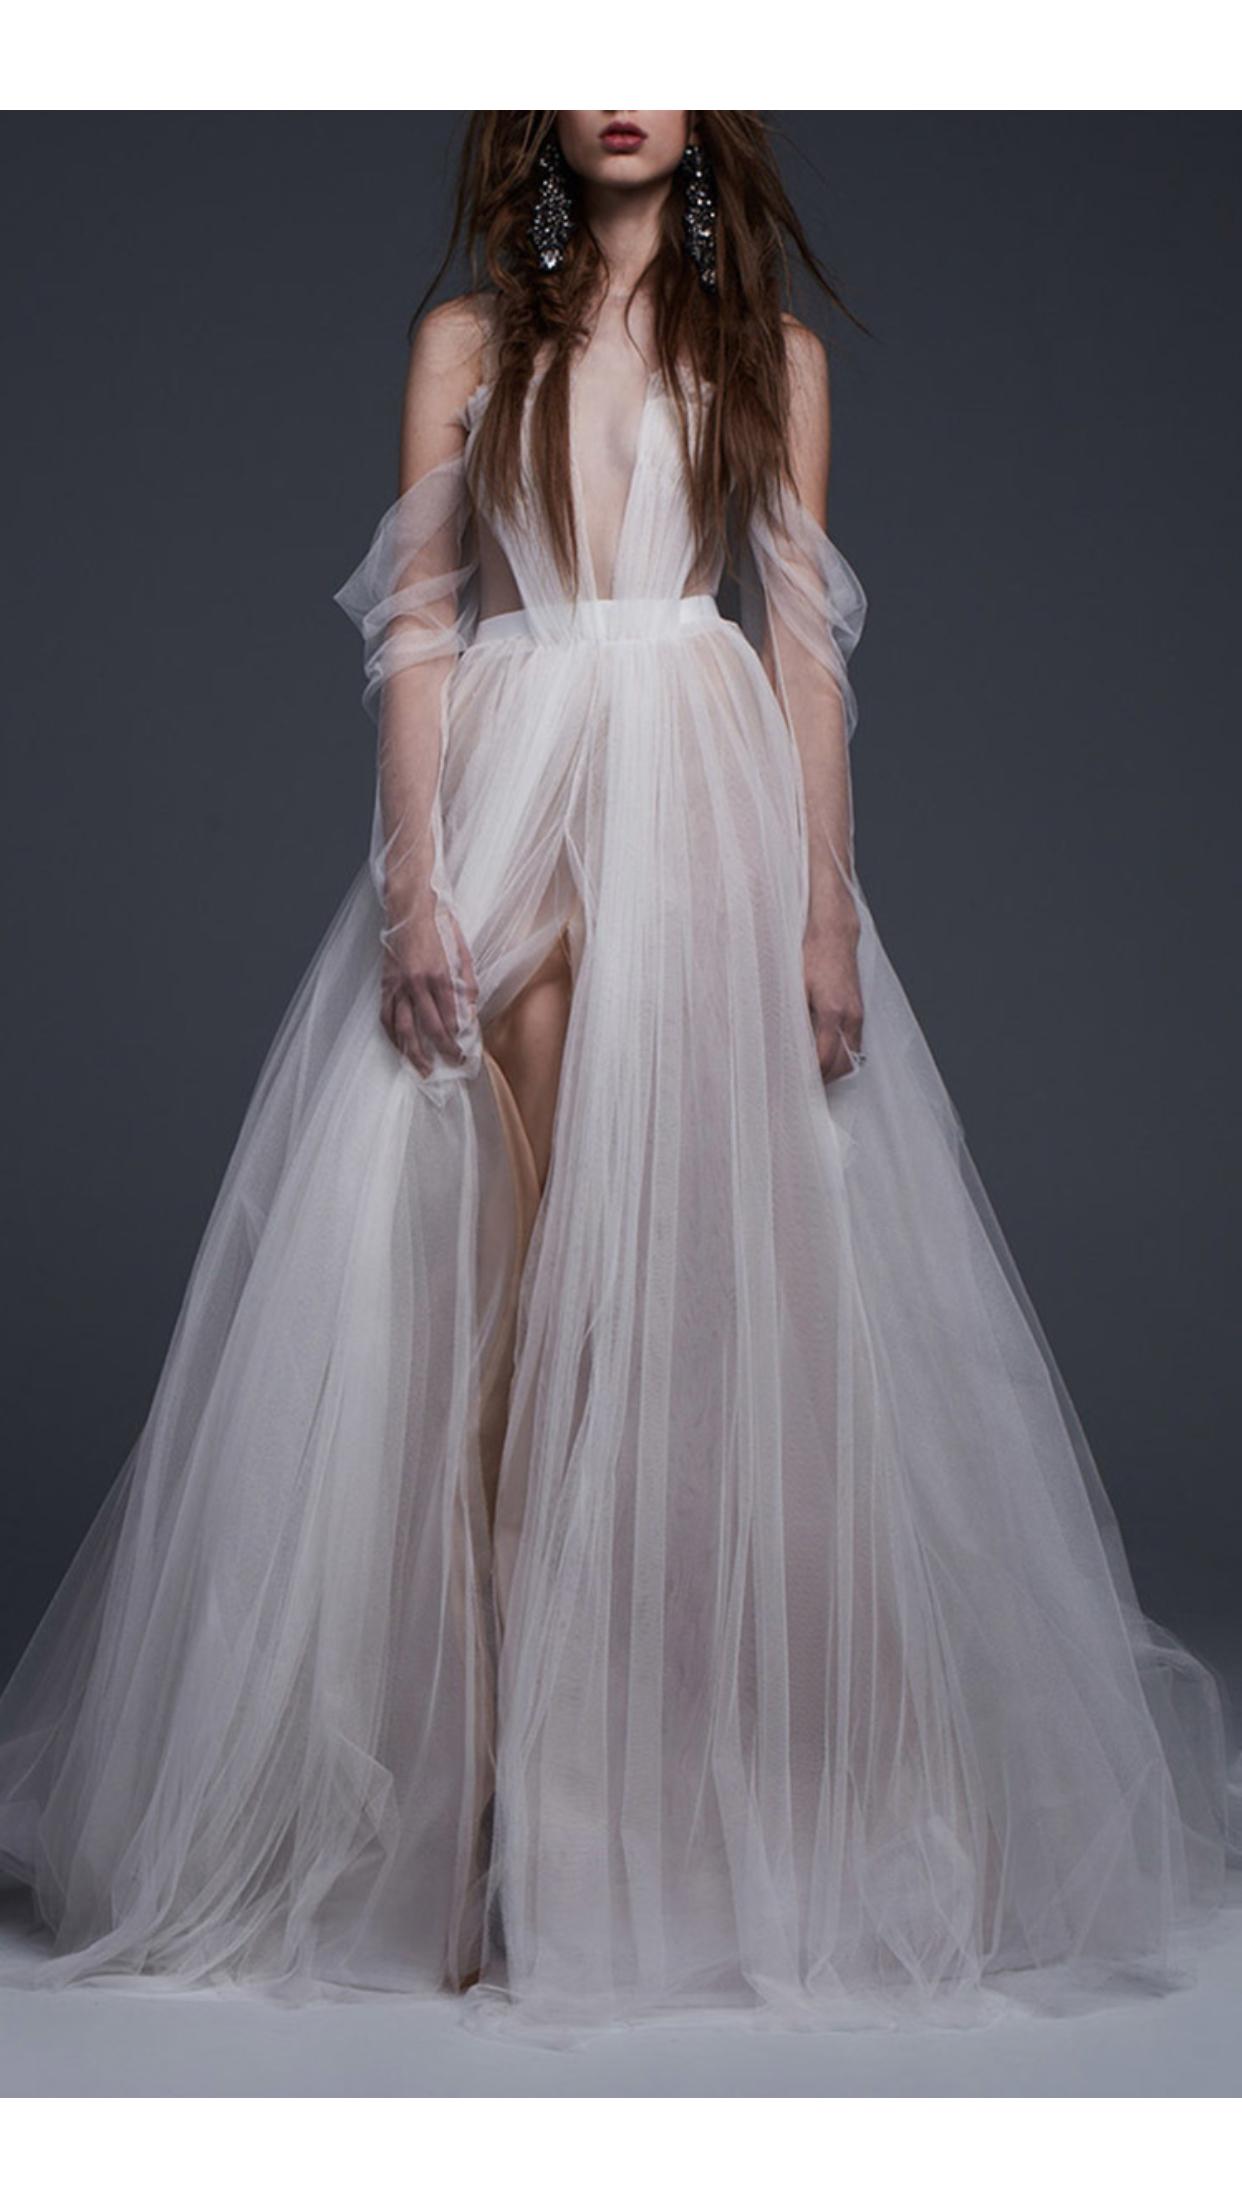 Vera Wang Bridal The Dress Wedding dresses, Dresses